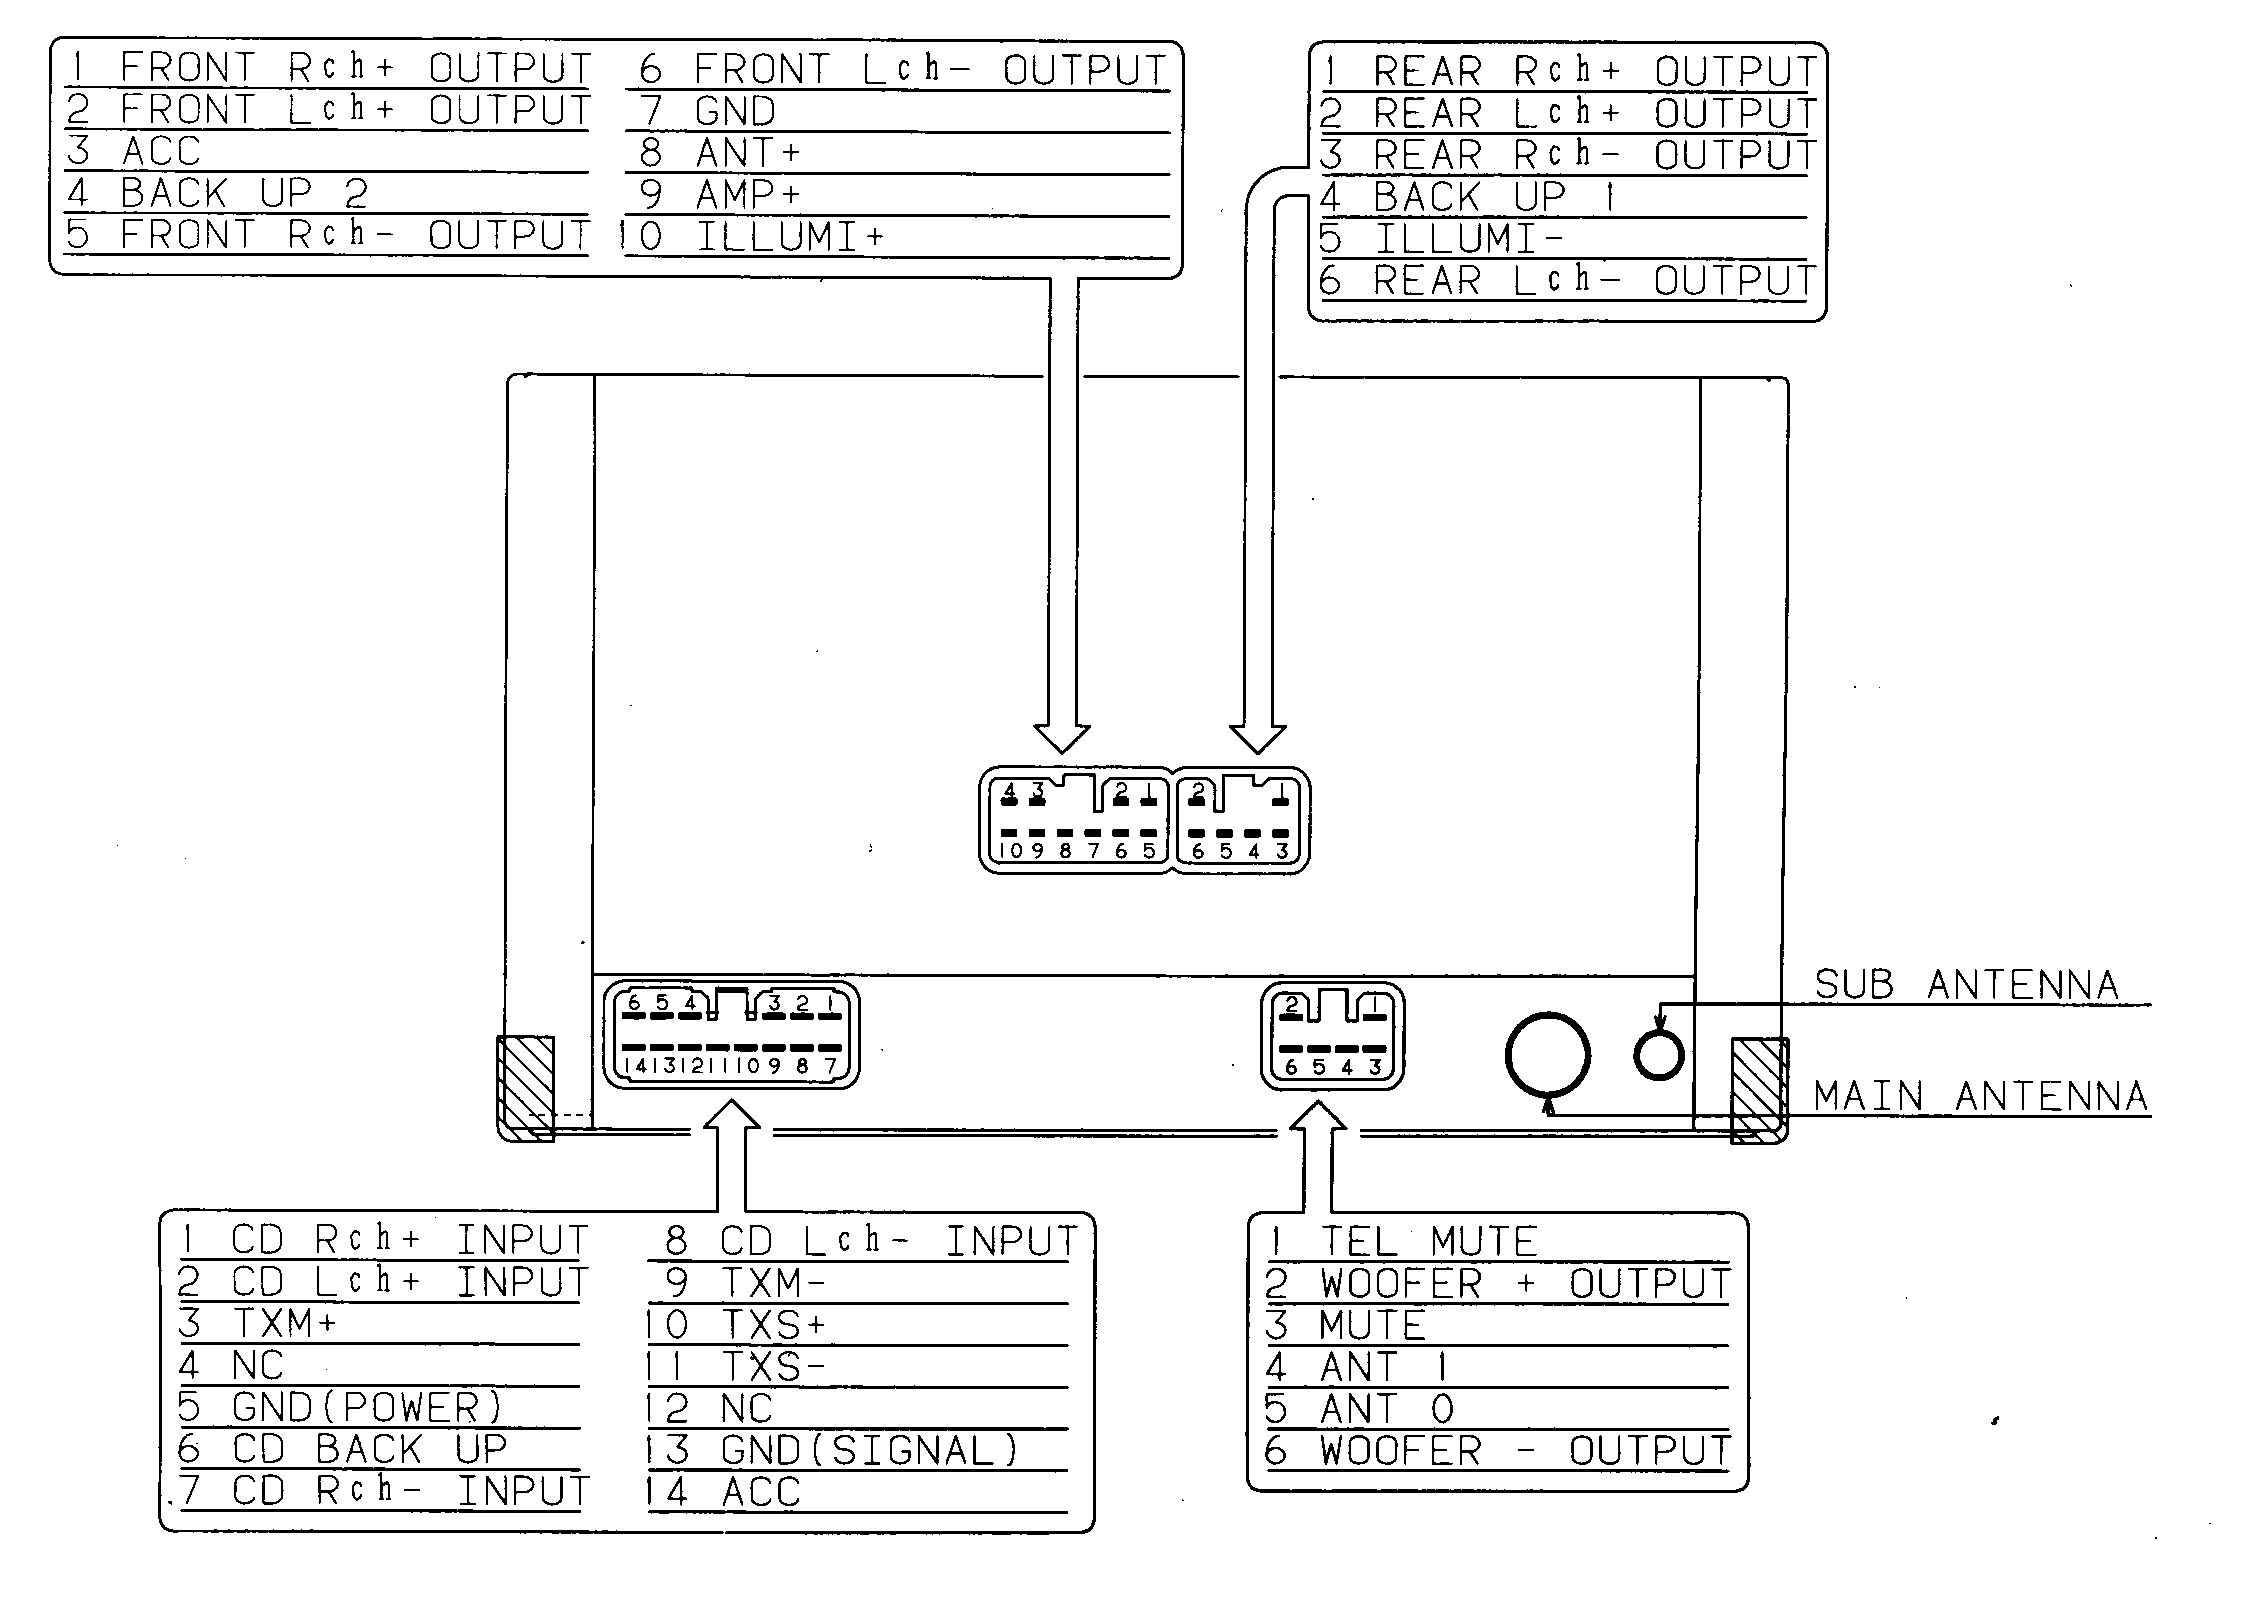 2005 Gmc Envoy 5 3 Fuse Box Detailed Schematic Diagrams 02 Trailblazer Under Hood Diagram 2002 Chevy